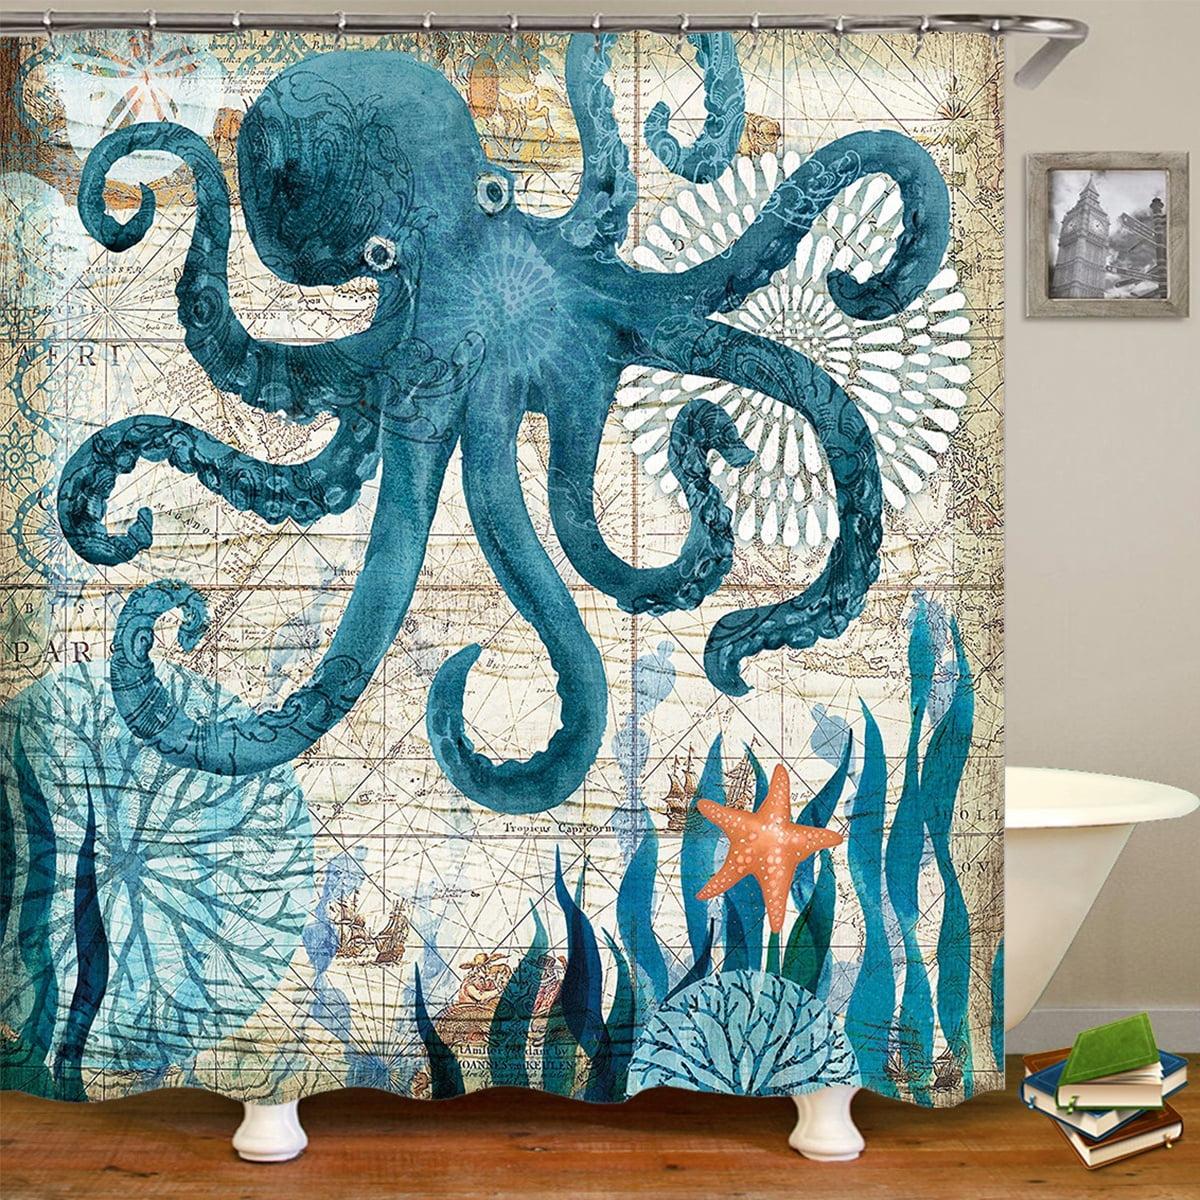 Waterproof Octopus Shower Curtain Polyester Fabric Bathroom